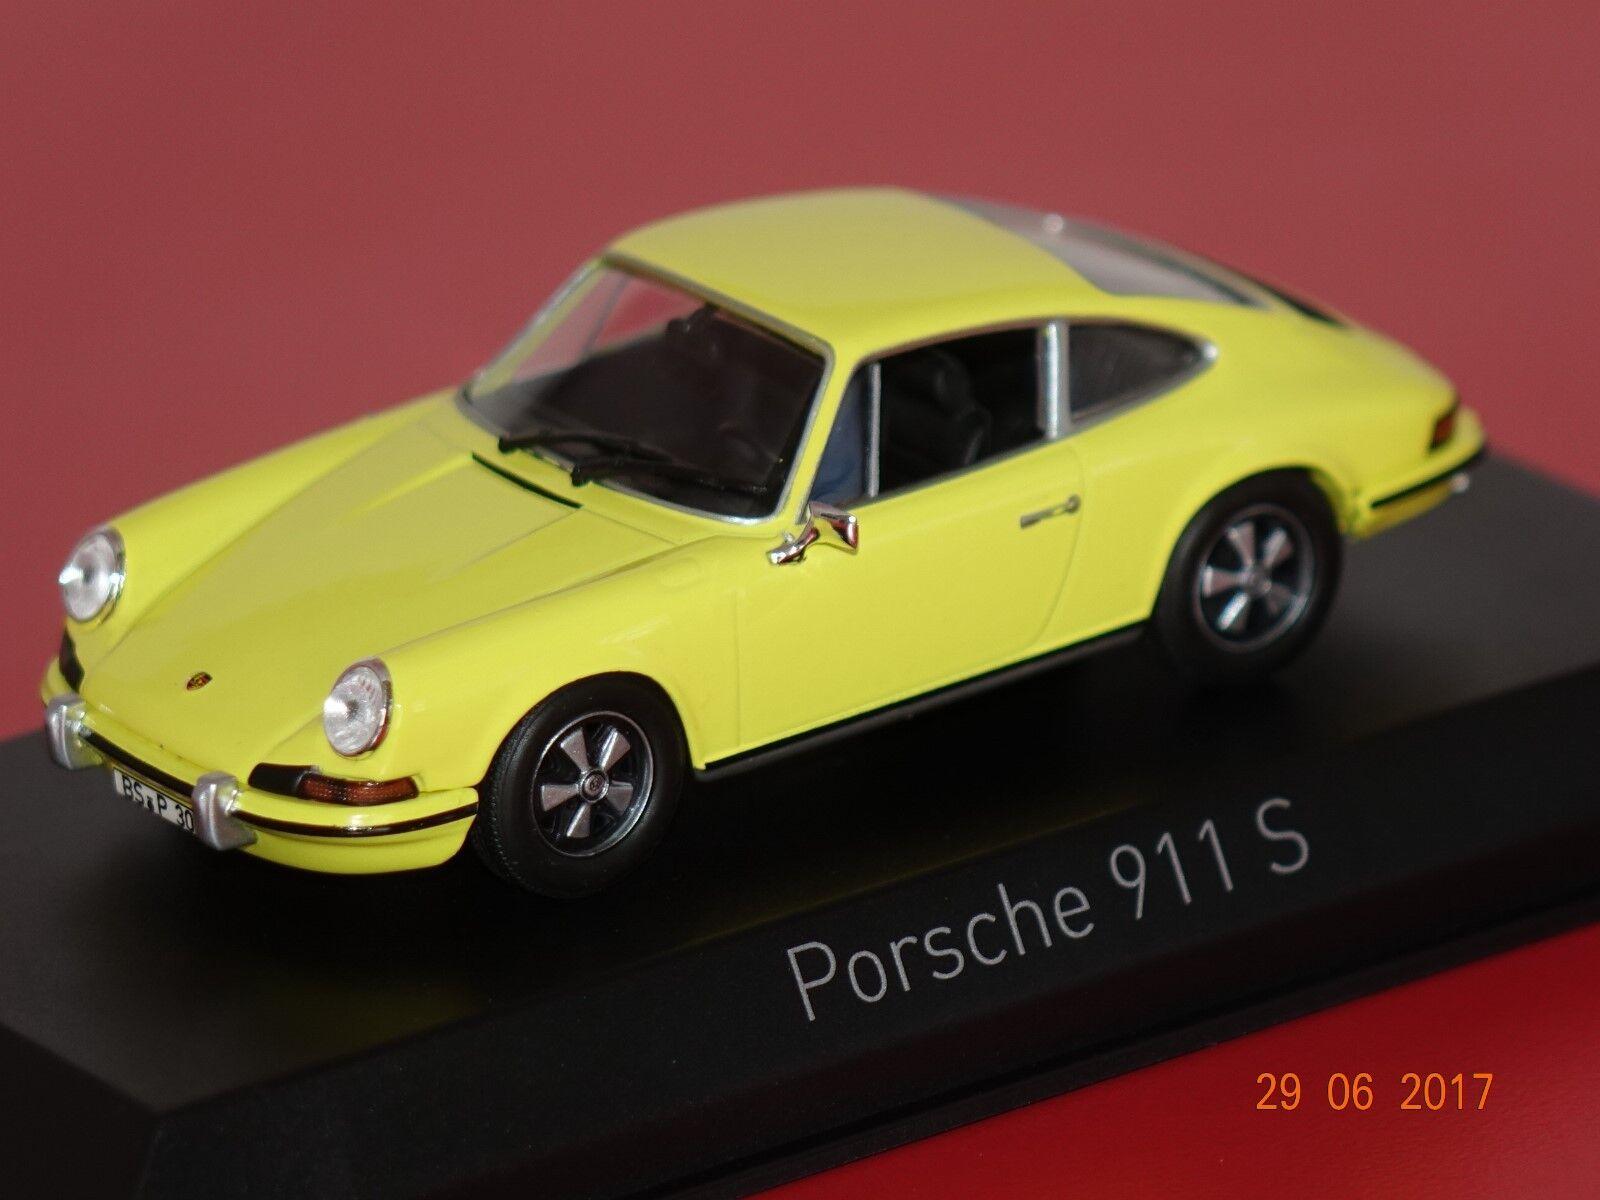 Porsche 911 S 2,4 1973 jaune 1 43 Norev 750056 NEUF + neuf dans sa boîte